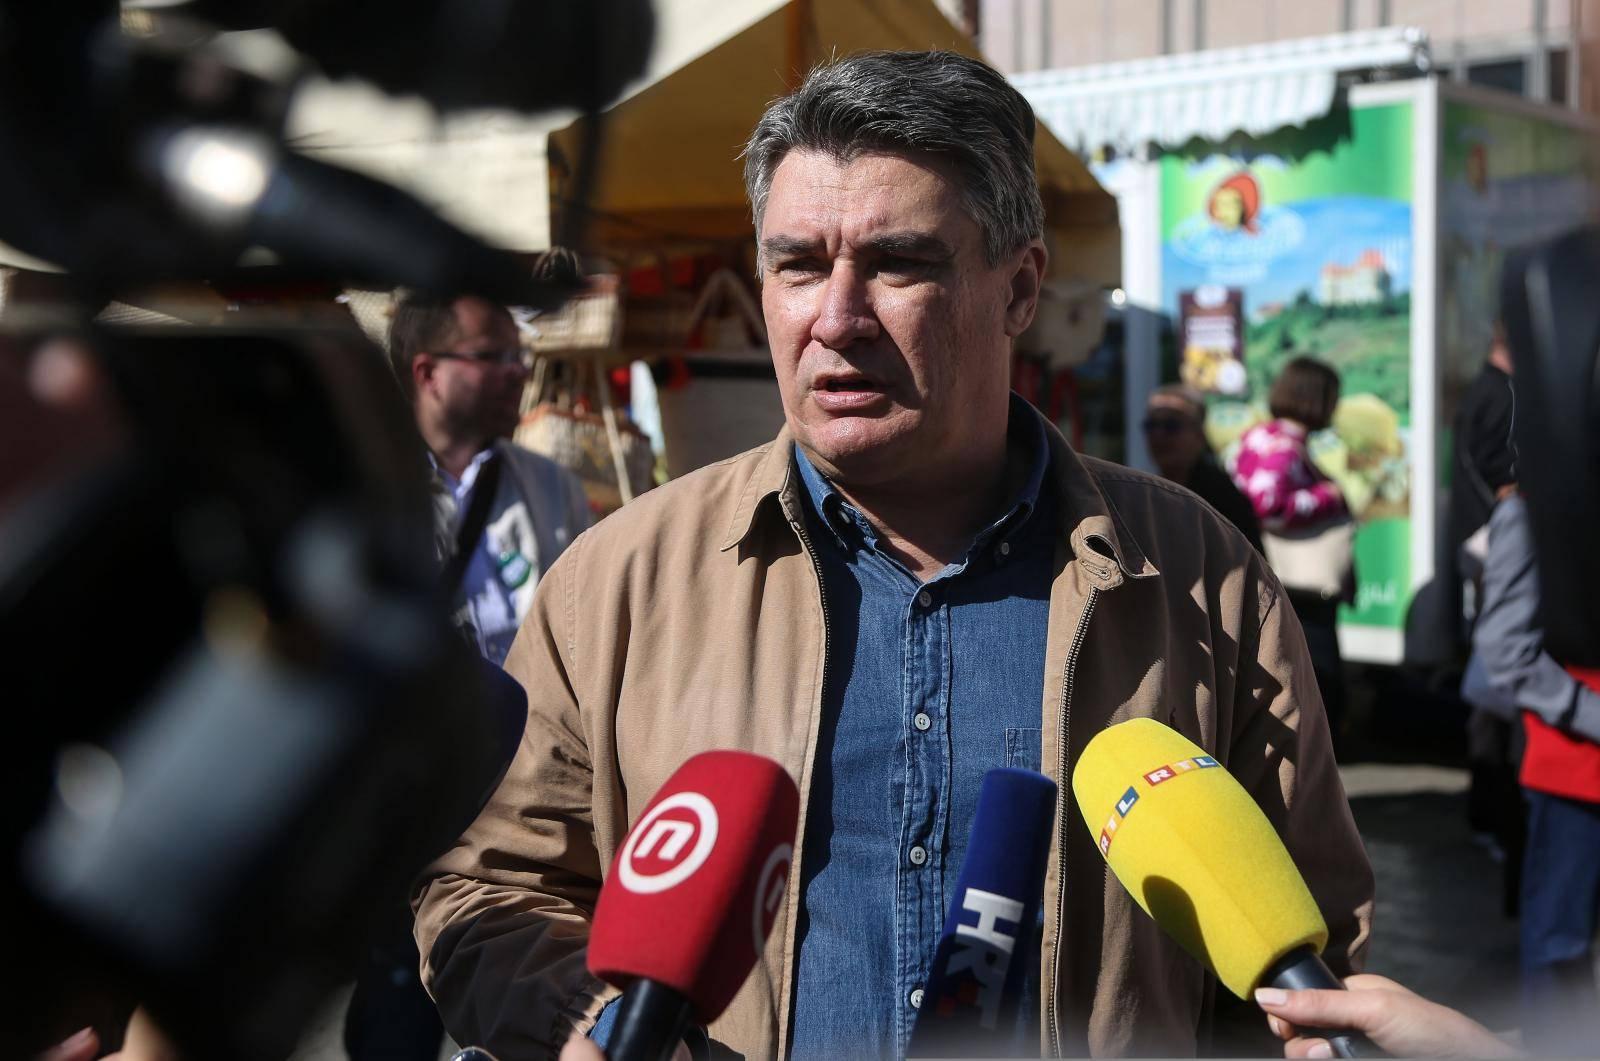 Zagreb: Predsjednički kandidat Zoran Milanović obišao sajam 100% zagorsko na glavnom gradskom trgu